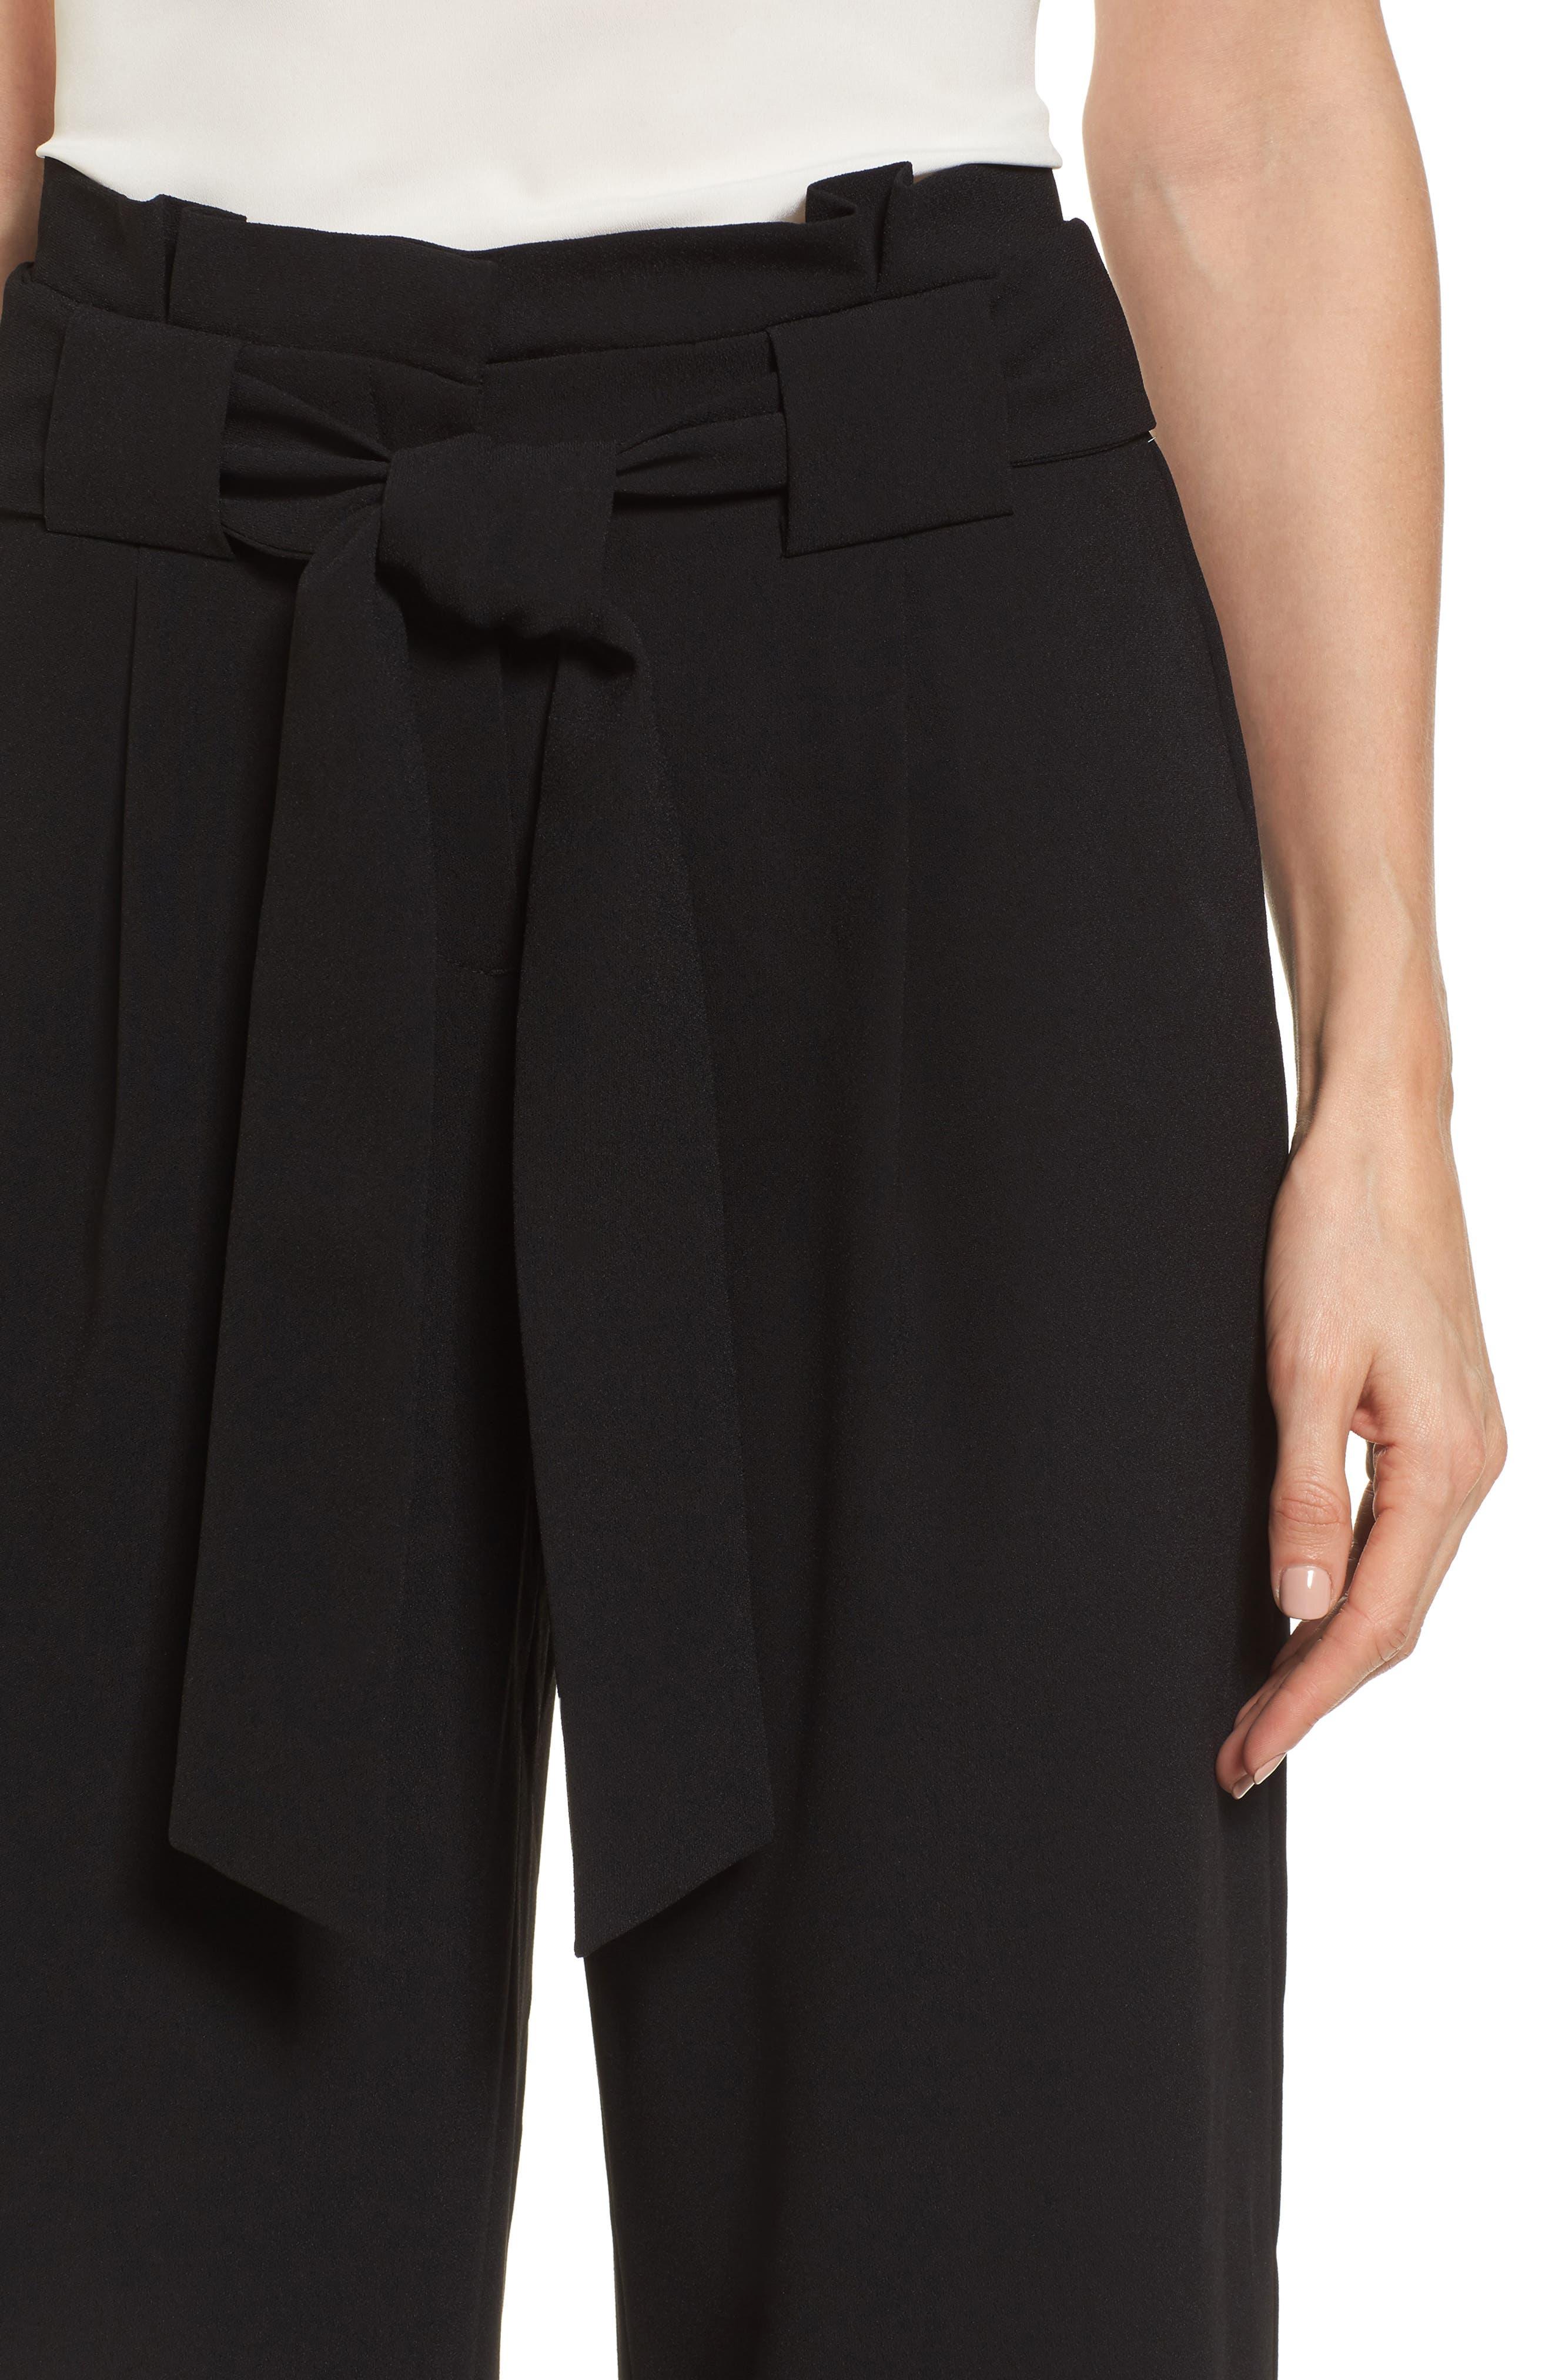 Belted Wide Leg Crop Pants,                             Alternate thumbnail 7, color,                             Black